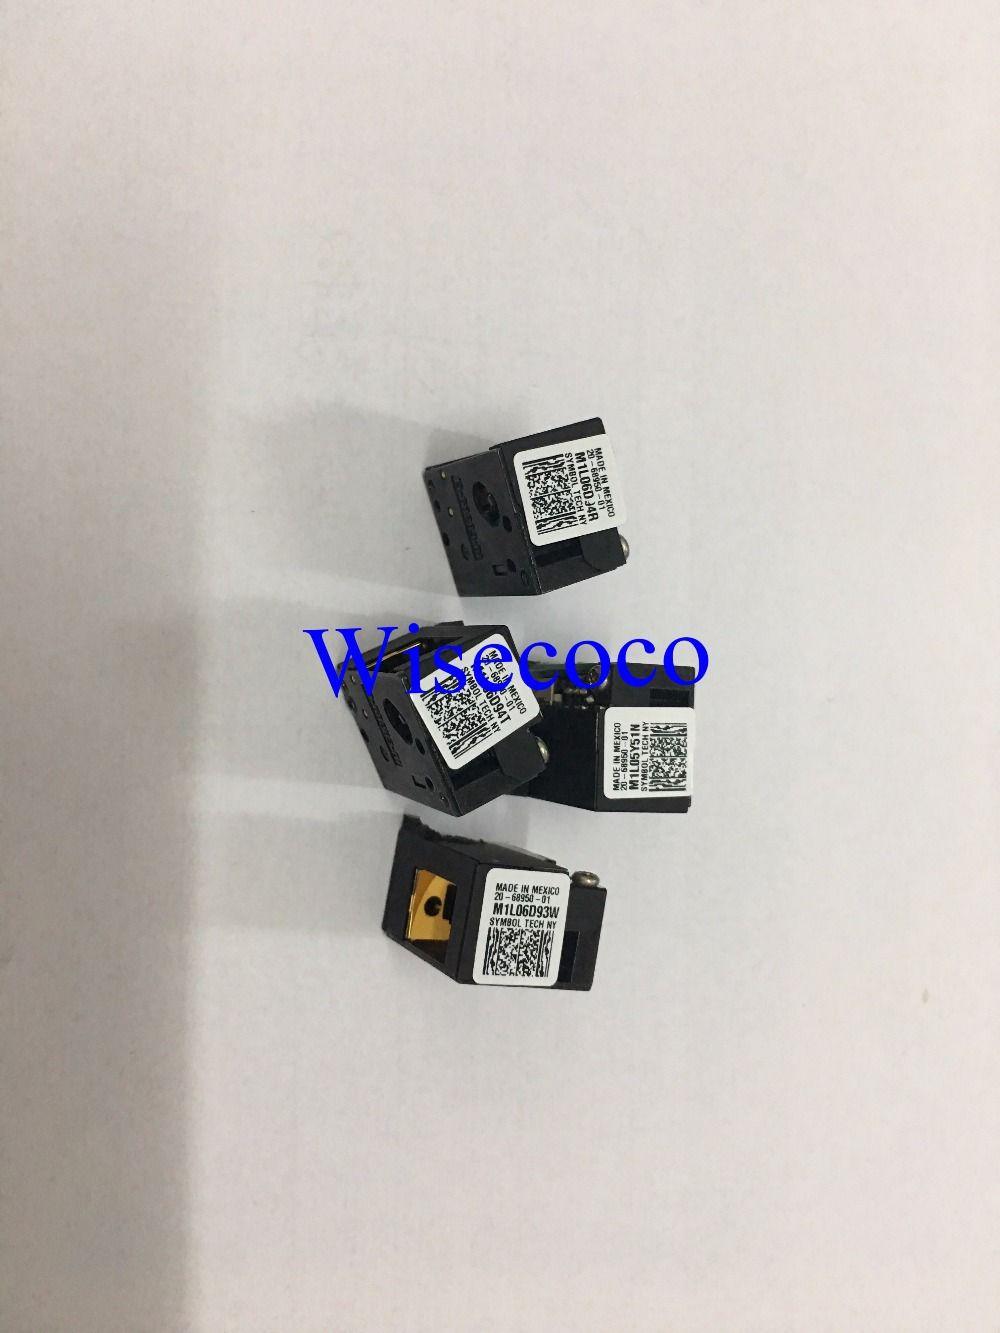 Pour Motorola Symbol MC1000 MC3000 MC3090 MC3190 MC50 MC70 MC75 MC75A MC55 MC55A MC65 MC9500 1D Scan Engine SE950